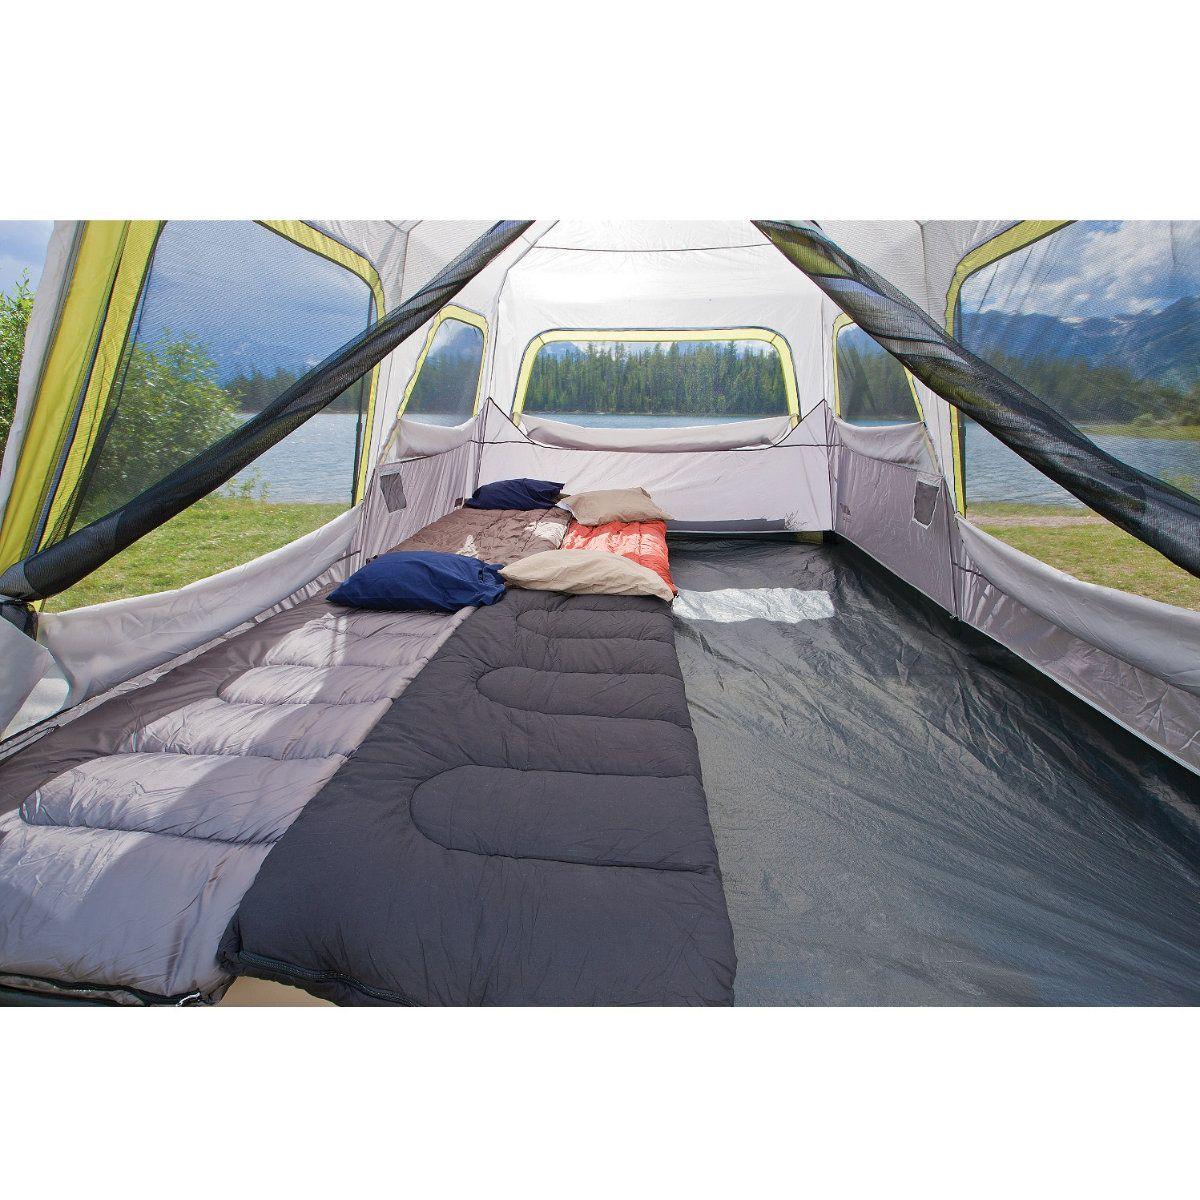 Coleman Signature Instant 10 Person Tent - Gander Mountain  sc 1 st  Pinterest & Coleman Signature Instant 10 Person Tent - Gander Mountain | GIMME ...